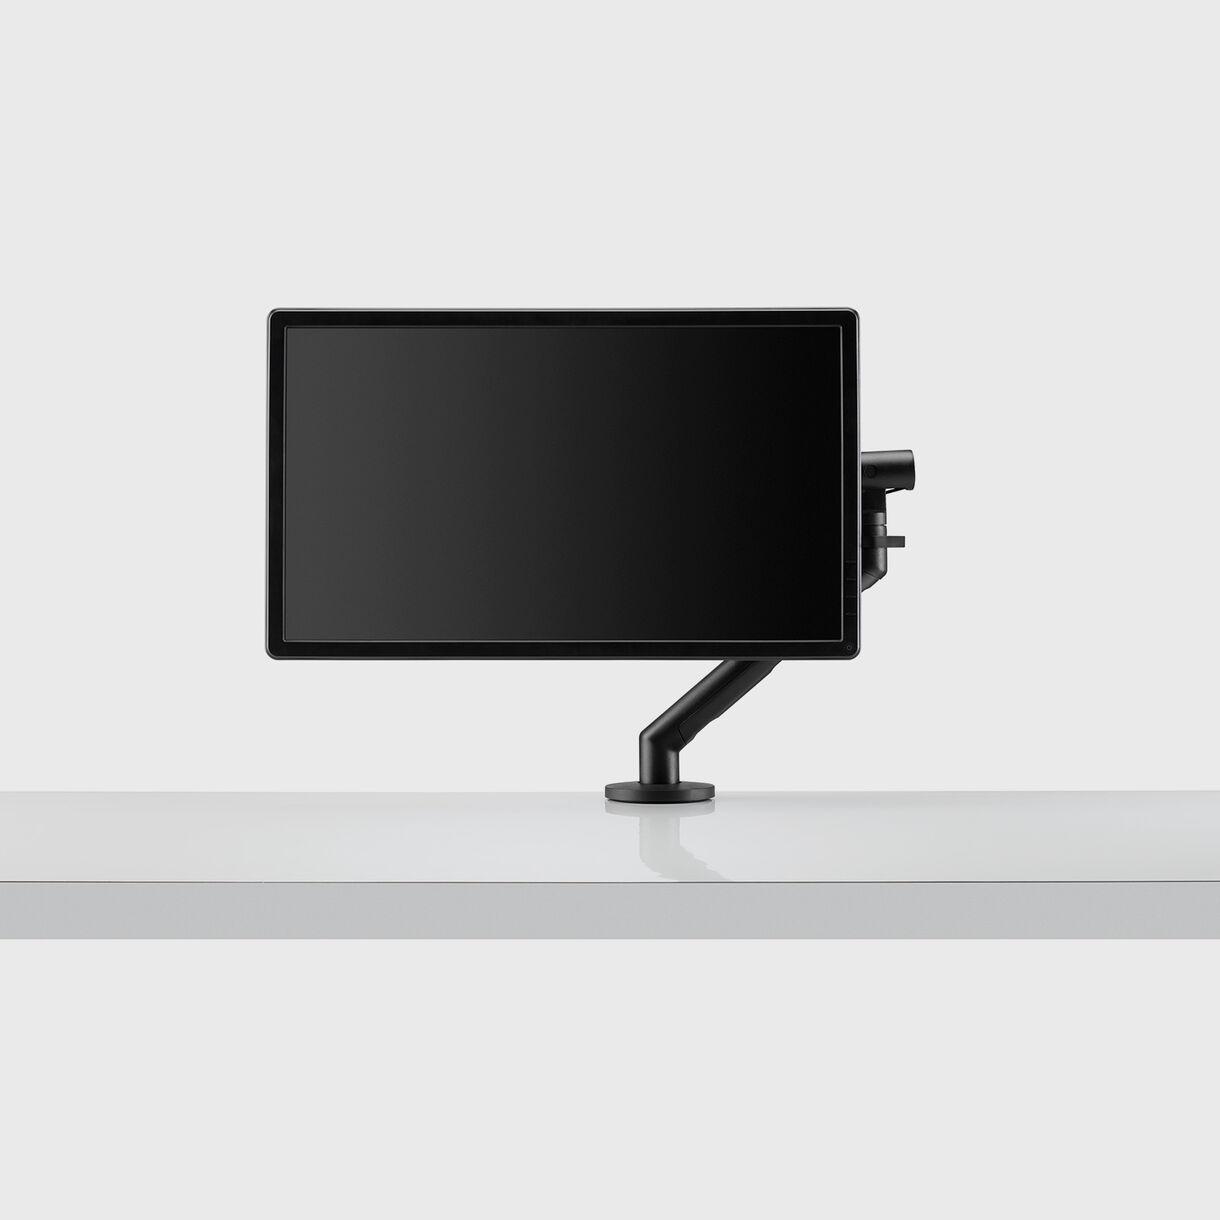 Flo Monitor Arm, Black